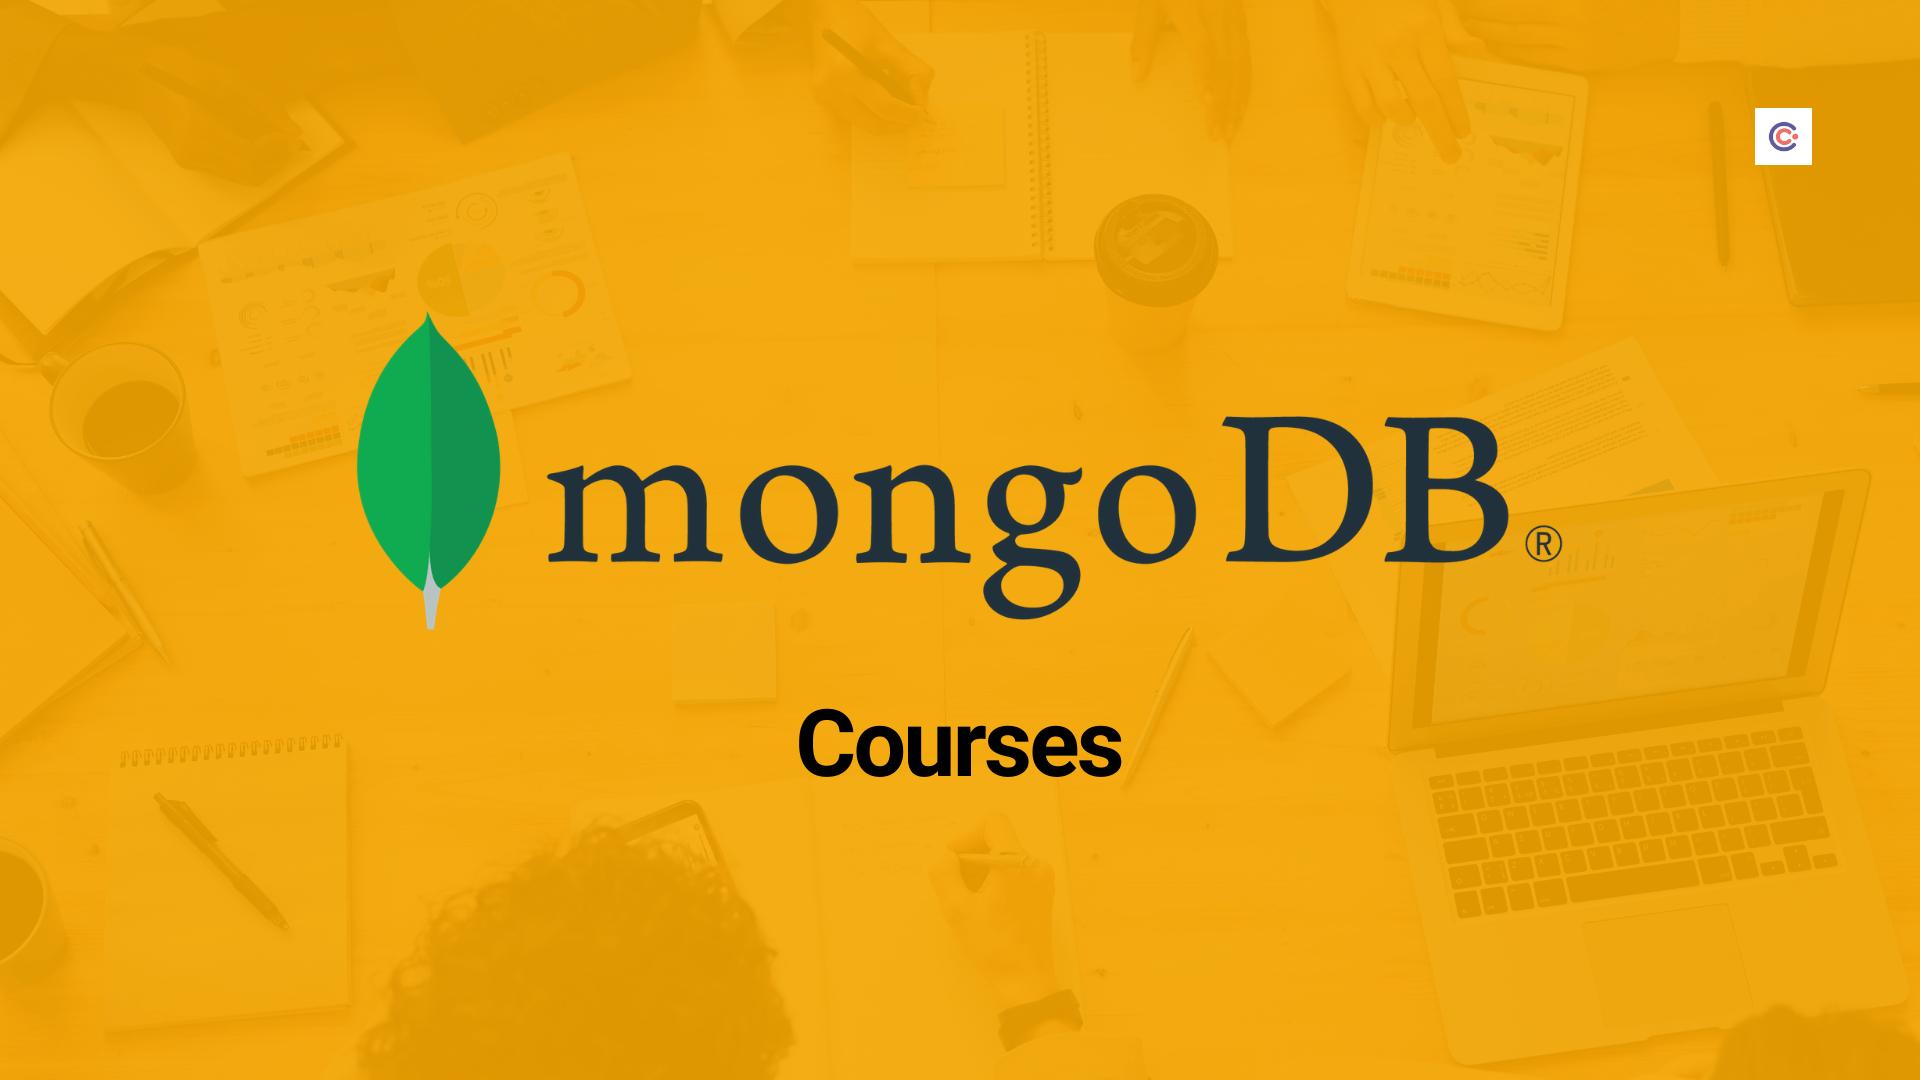 10 Best MongoDB Courses - Learn MongoDB Online